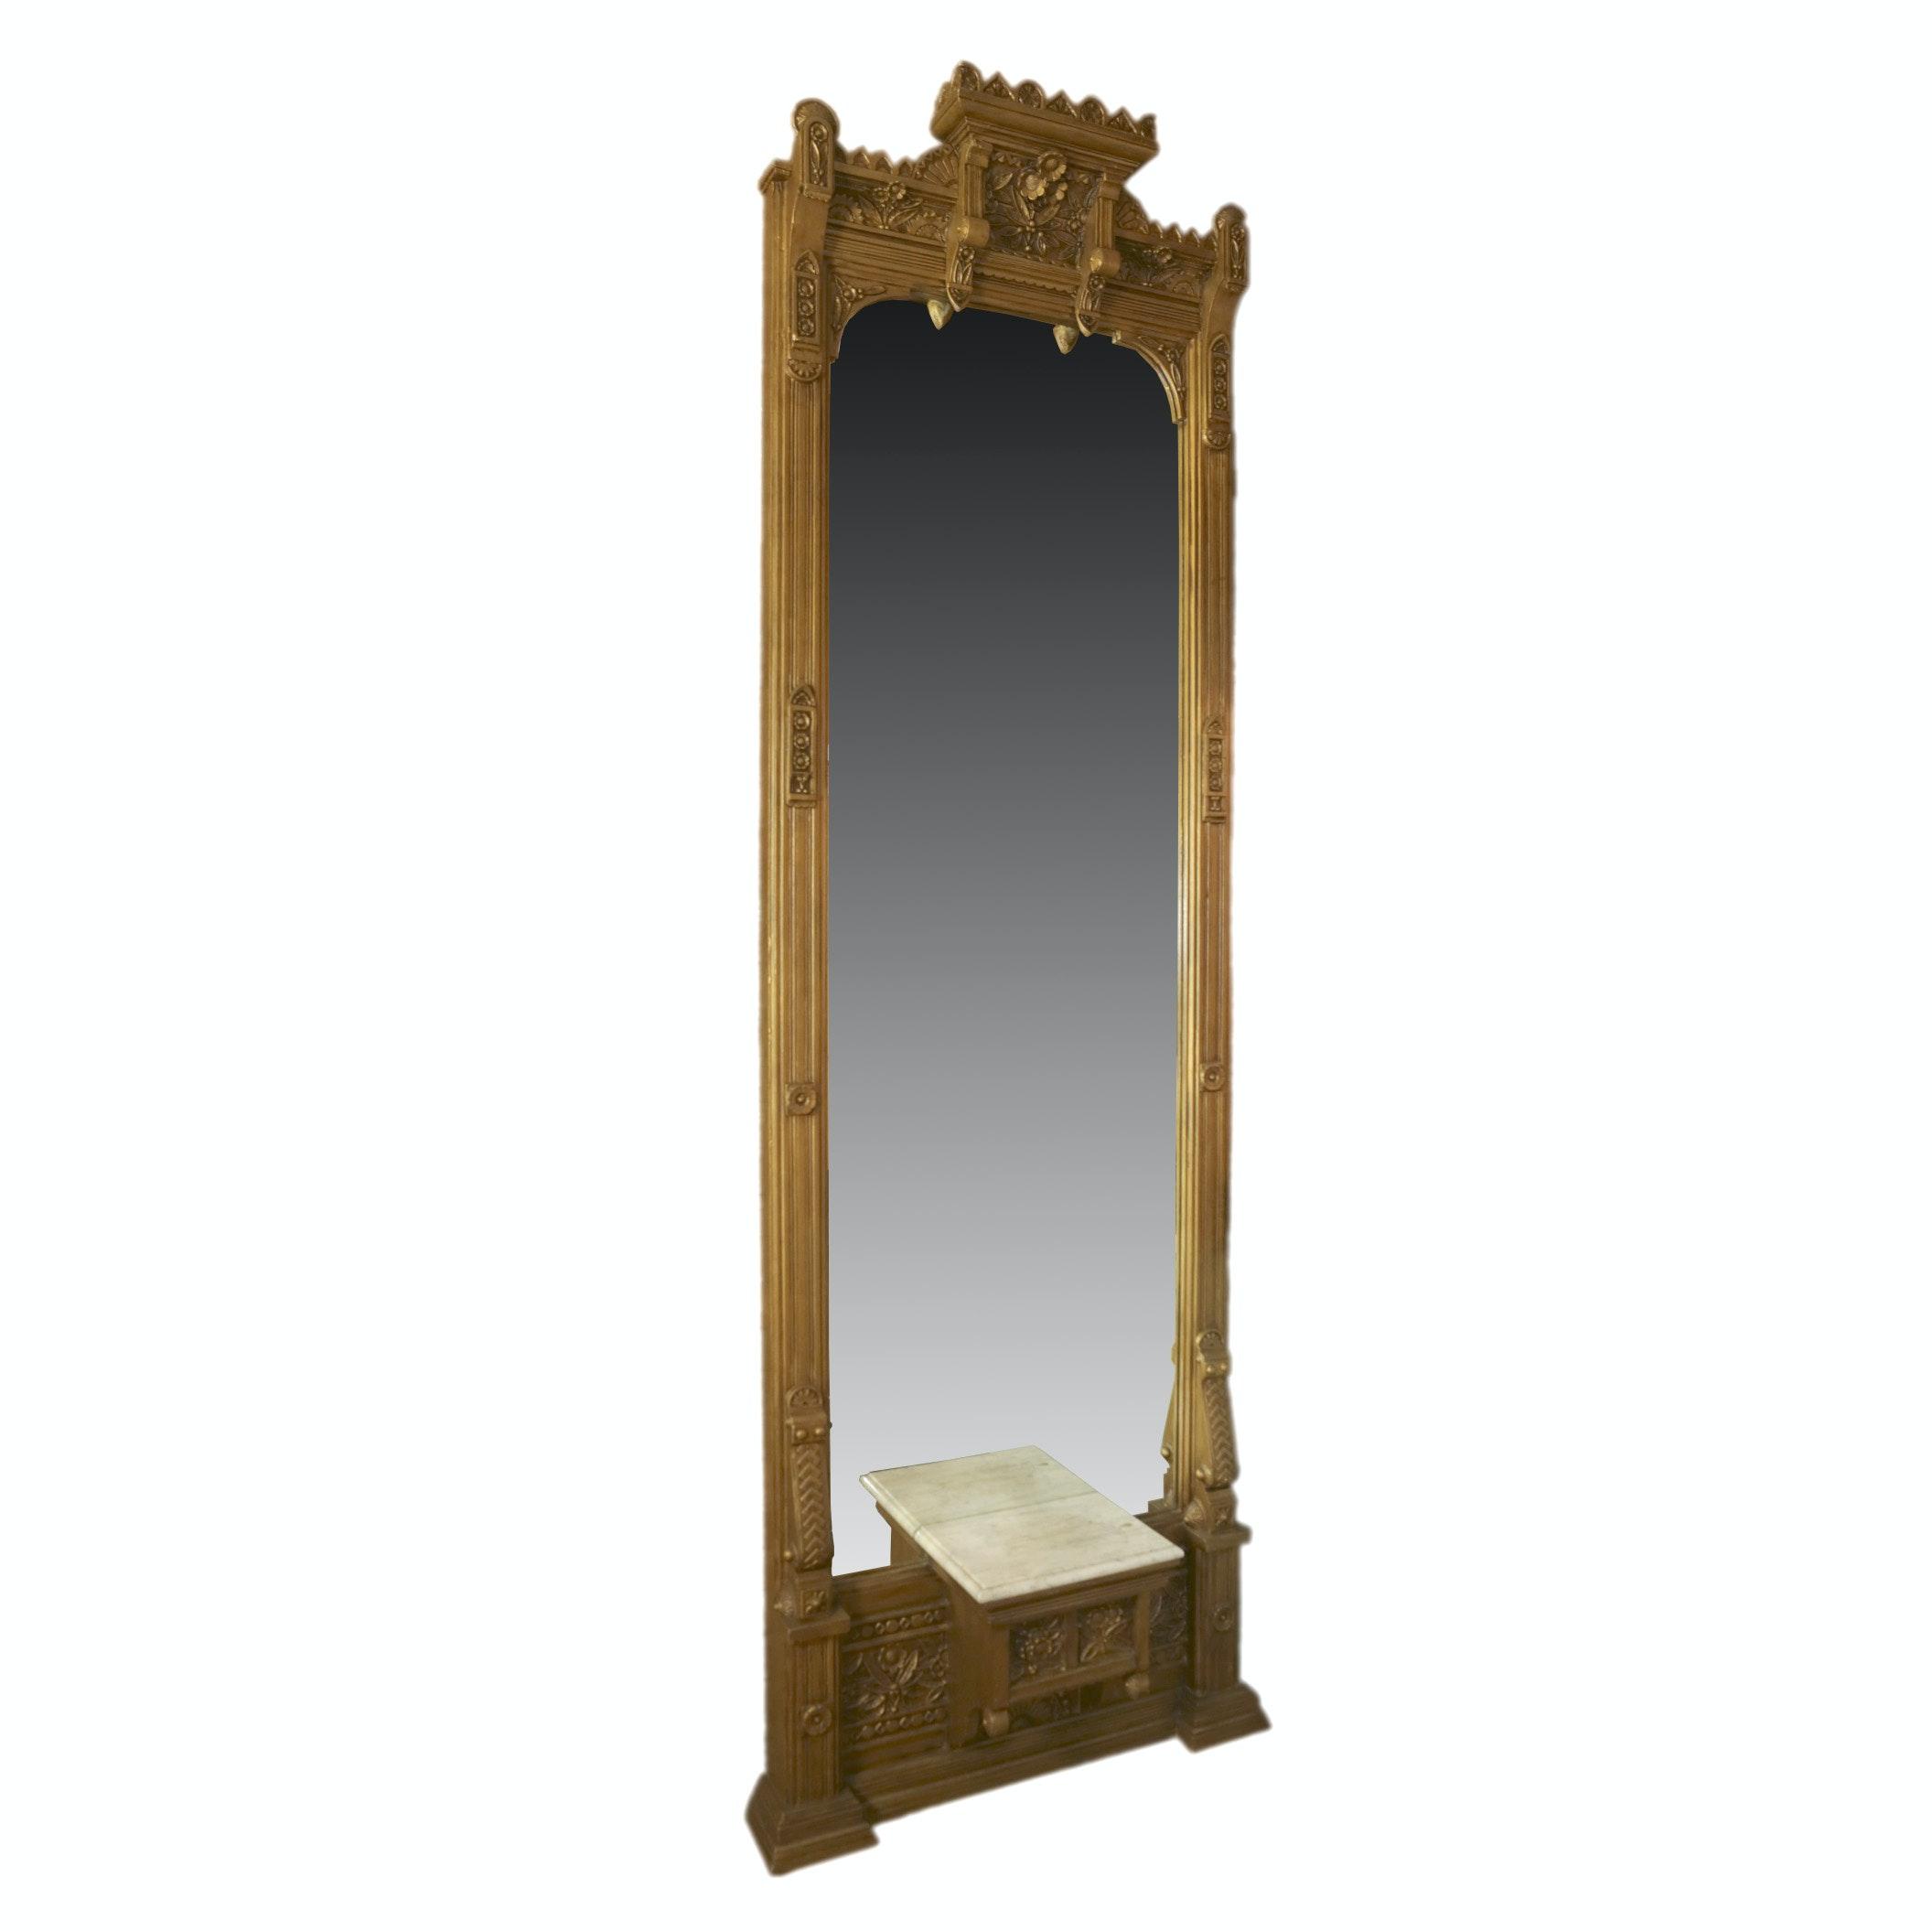 Victorian Pier Mirror with Marble Shelf